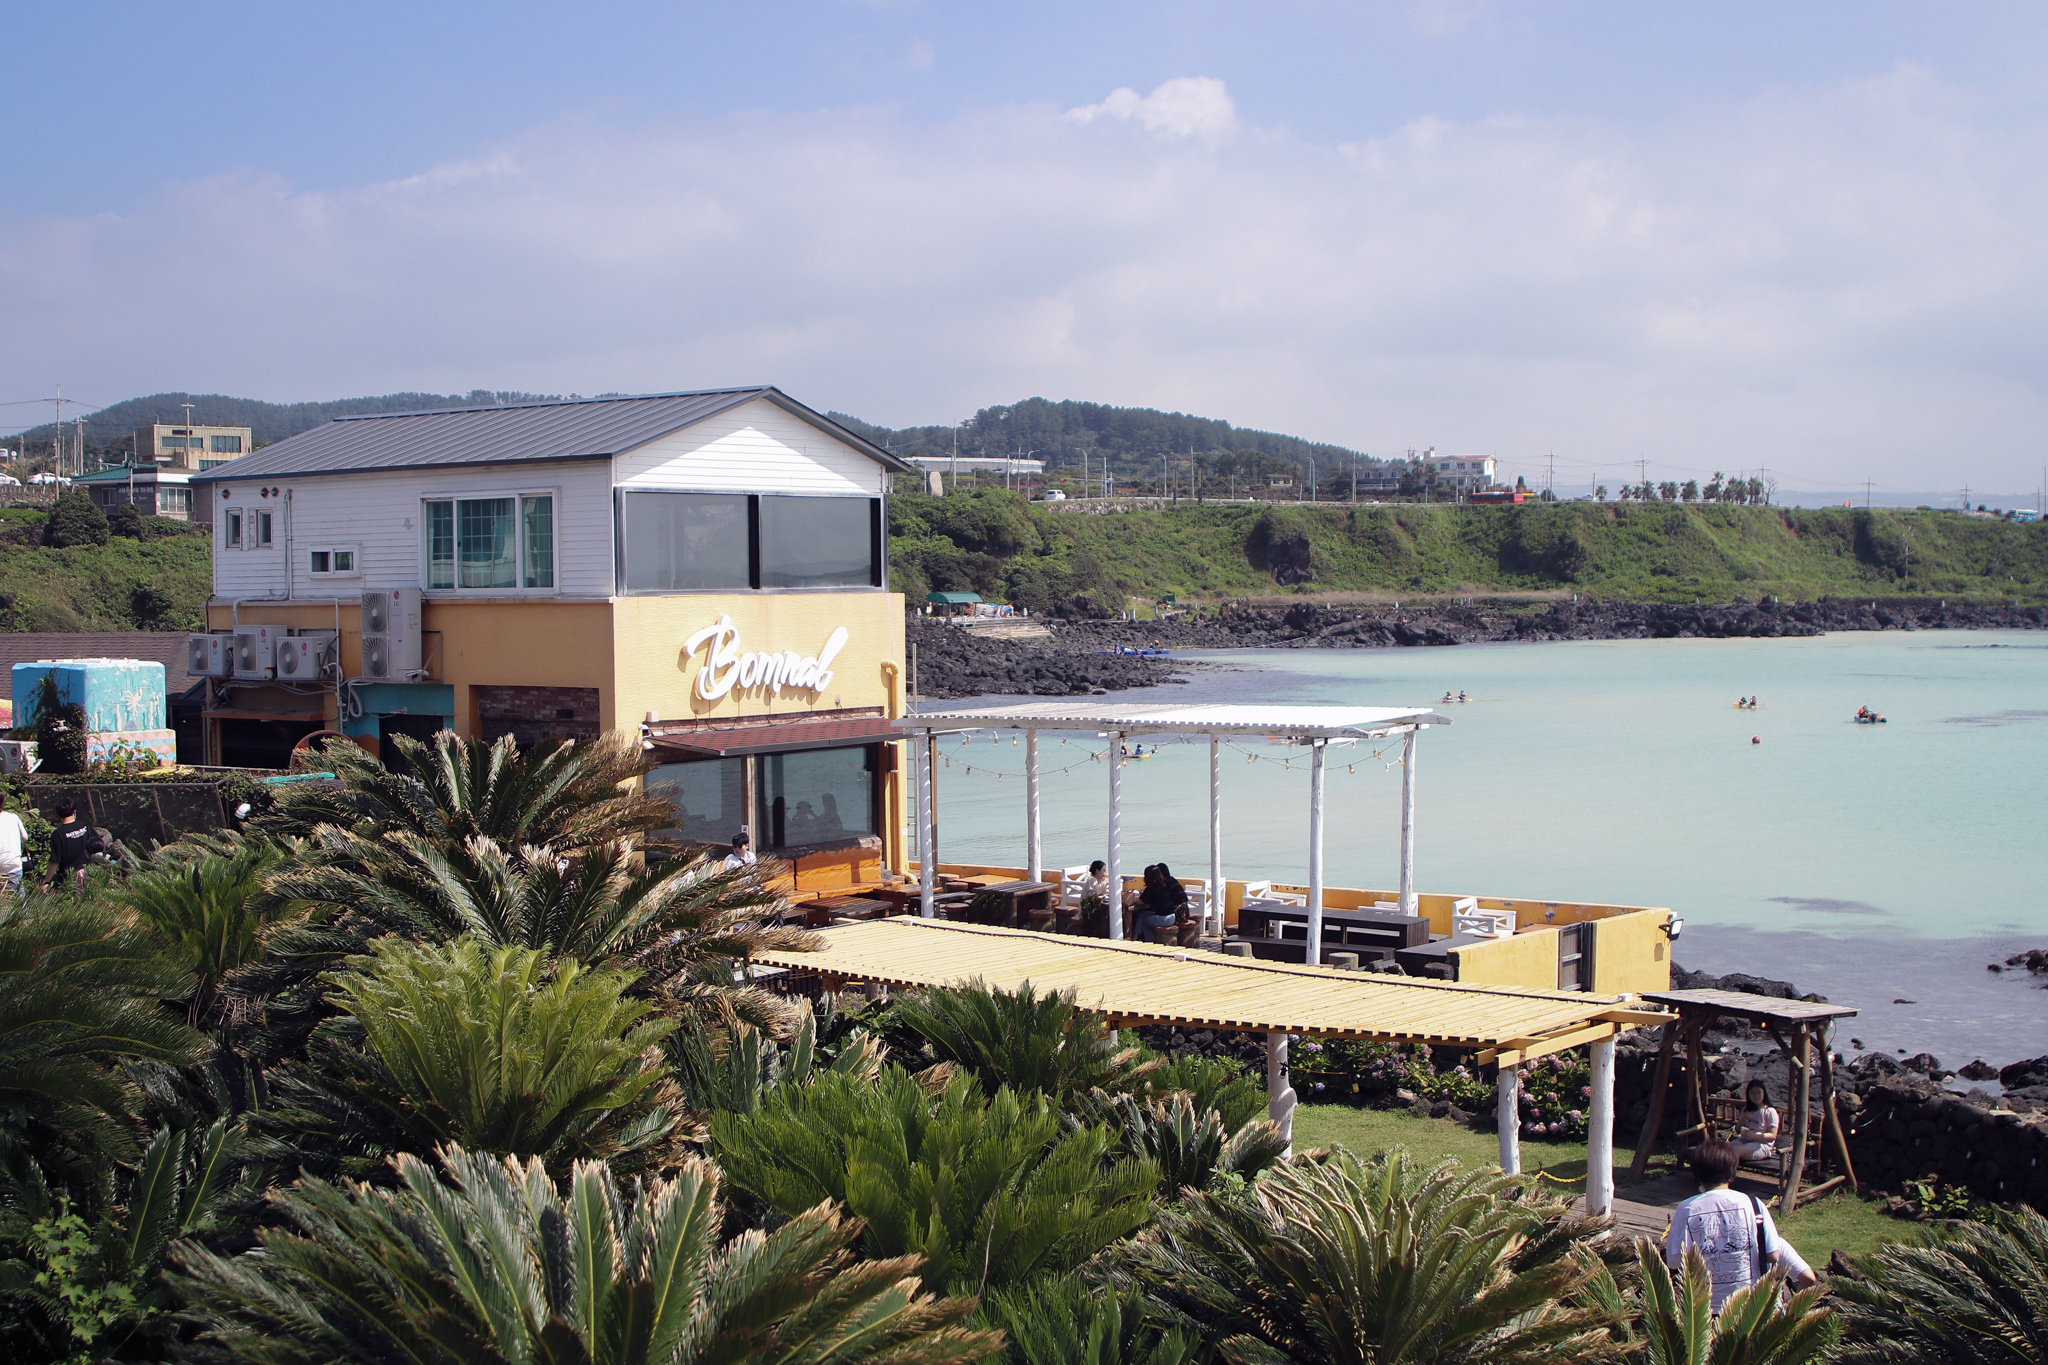 Beautiful cafe in Jeju Overlooking the Ocean